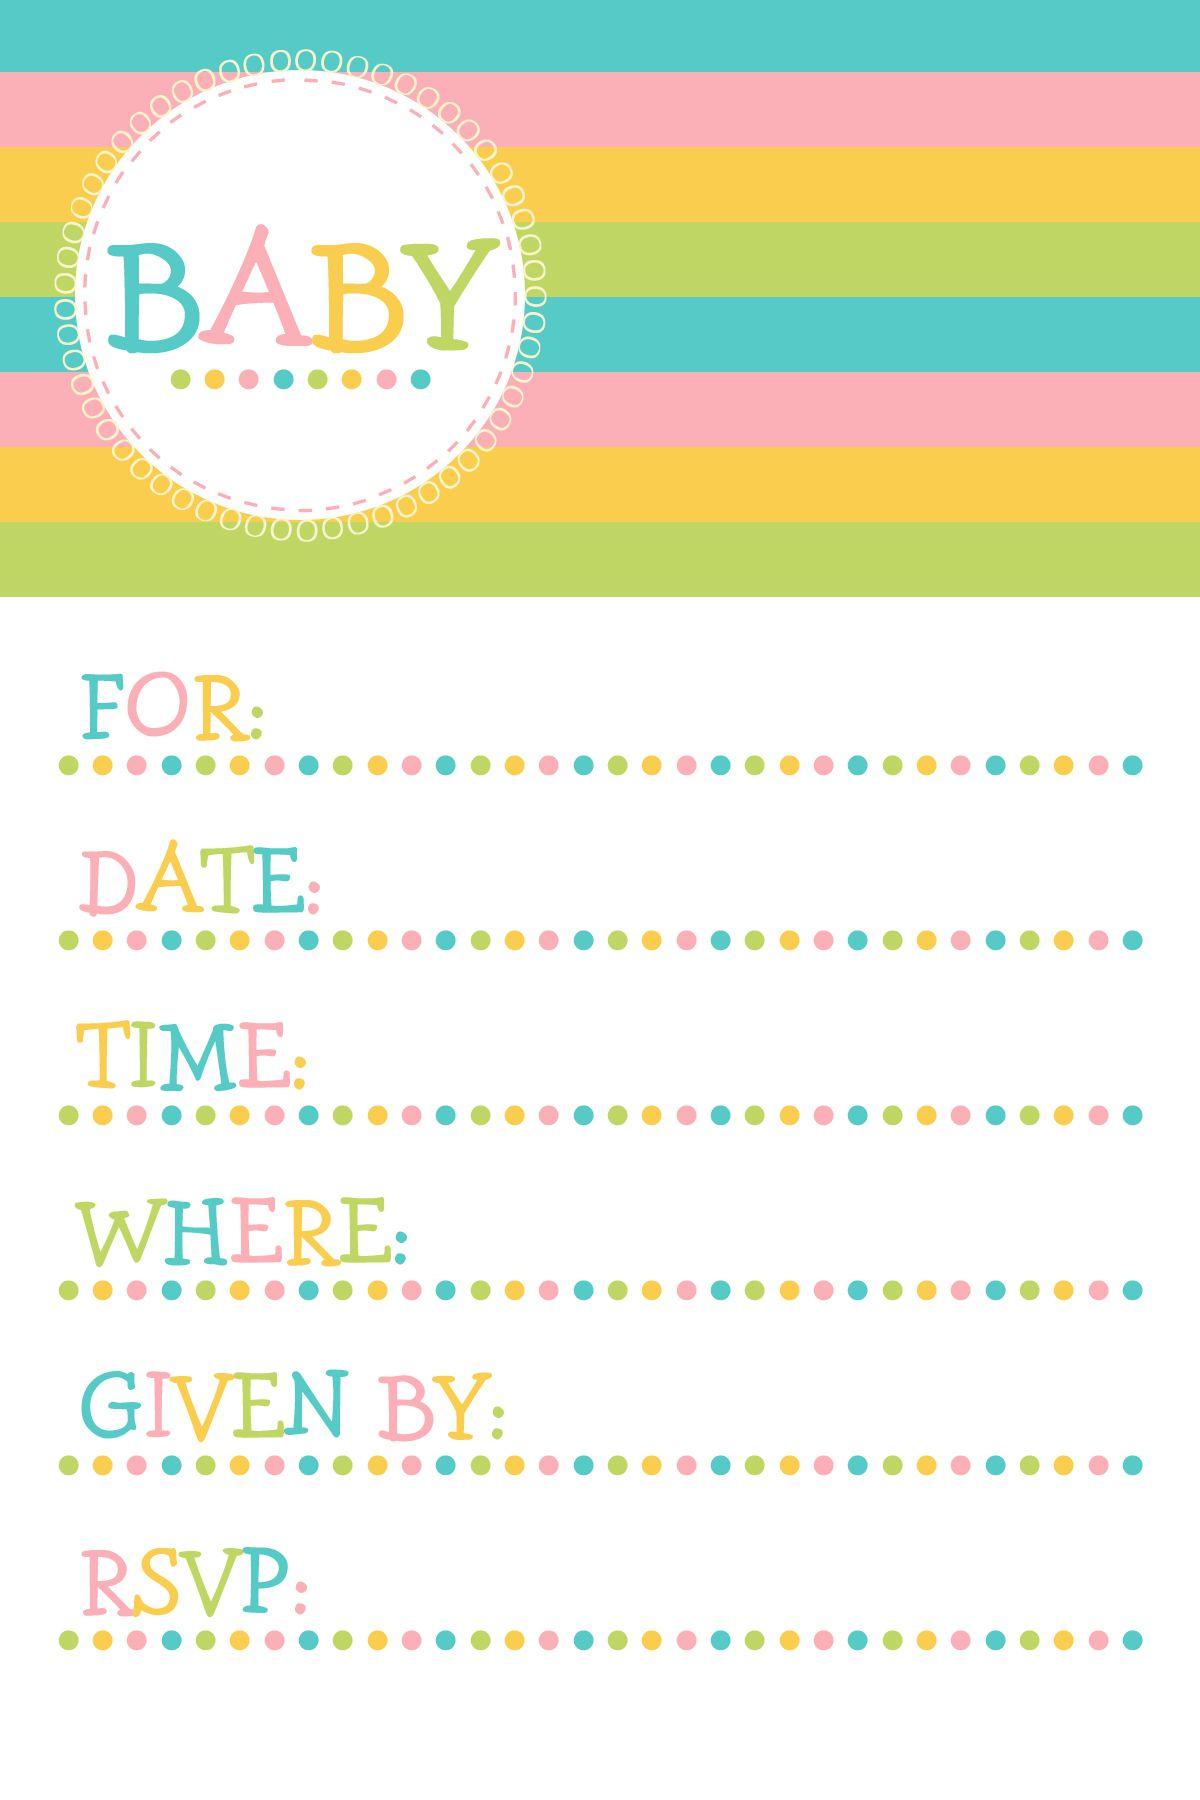 25 Adorable Free Printable Baby Shower Invitations - Free Printable Blank Baby Shower Invitations